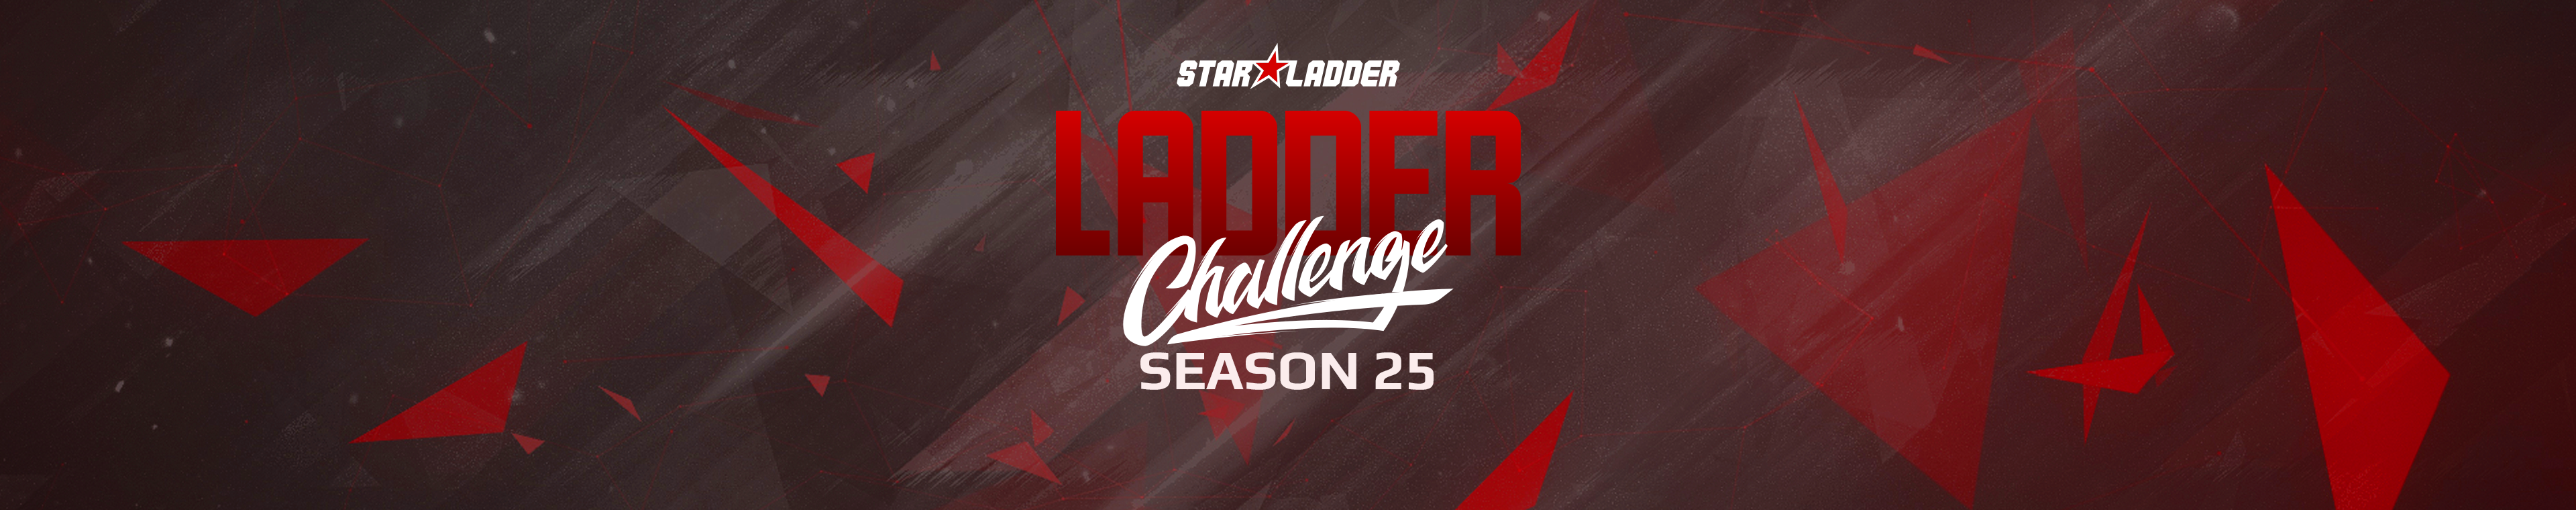 Ladder Challenge Season 25